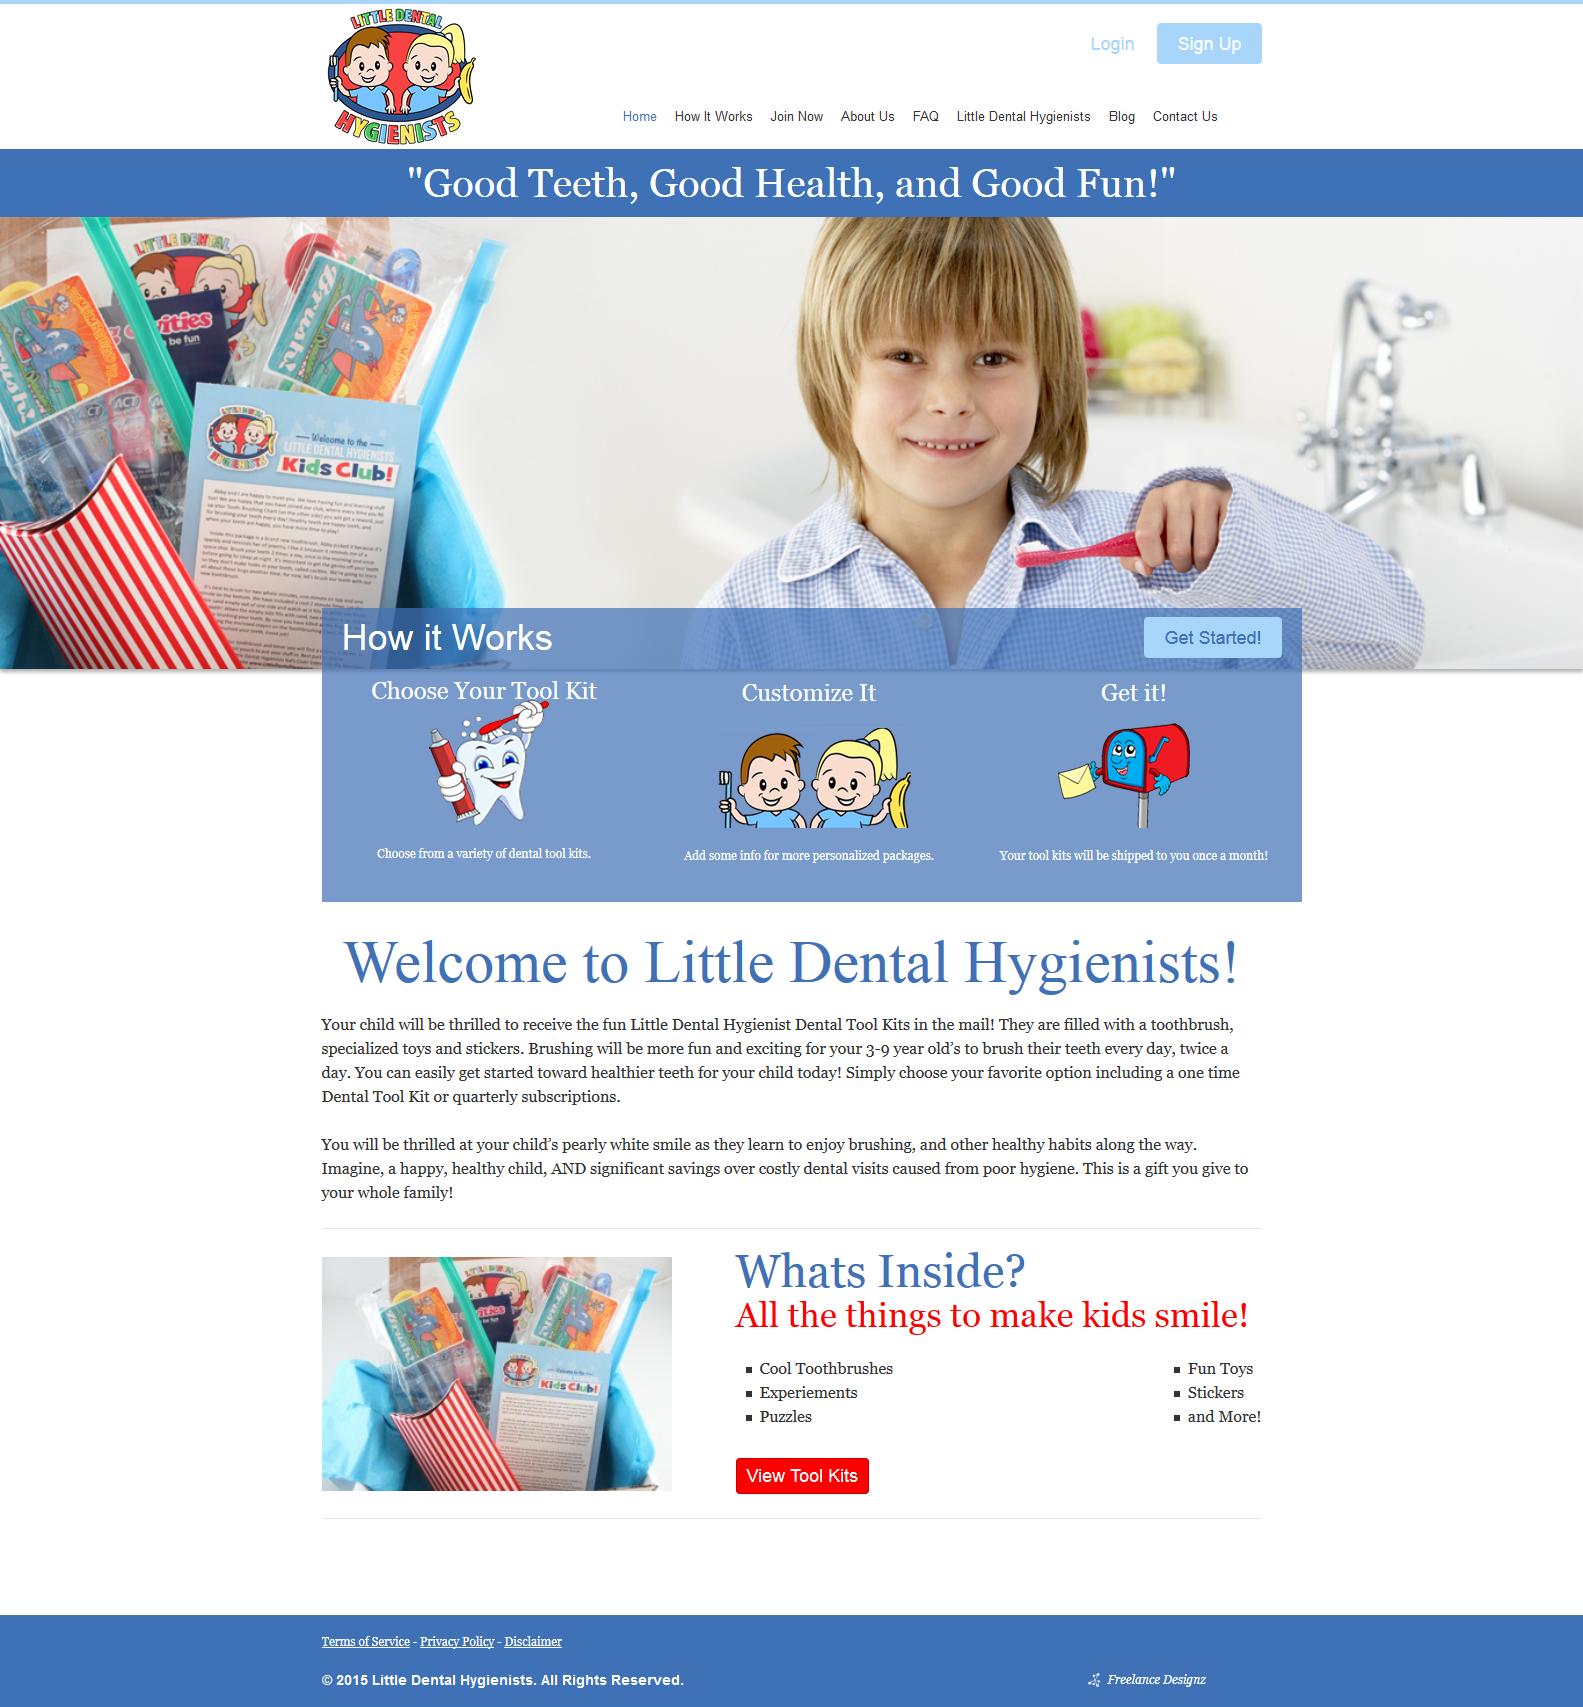 Little Dental Hygienists